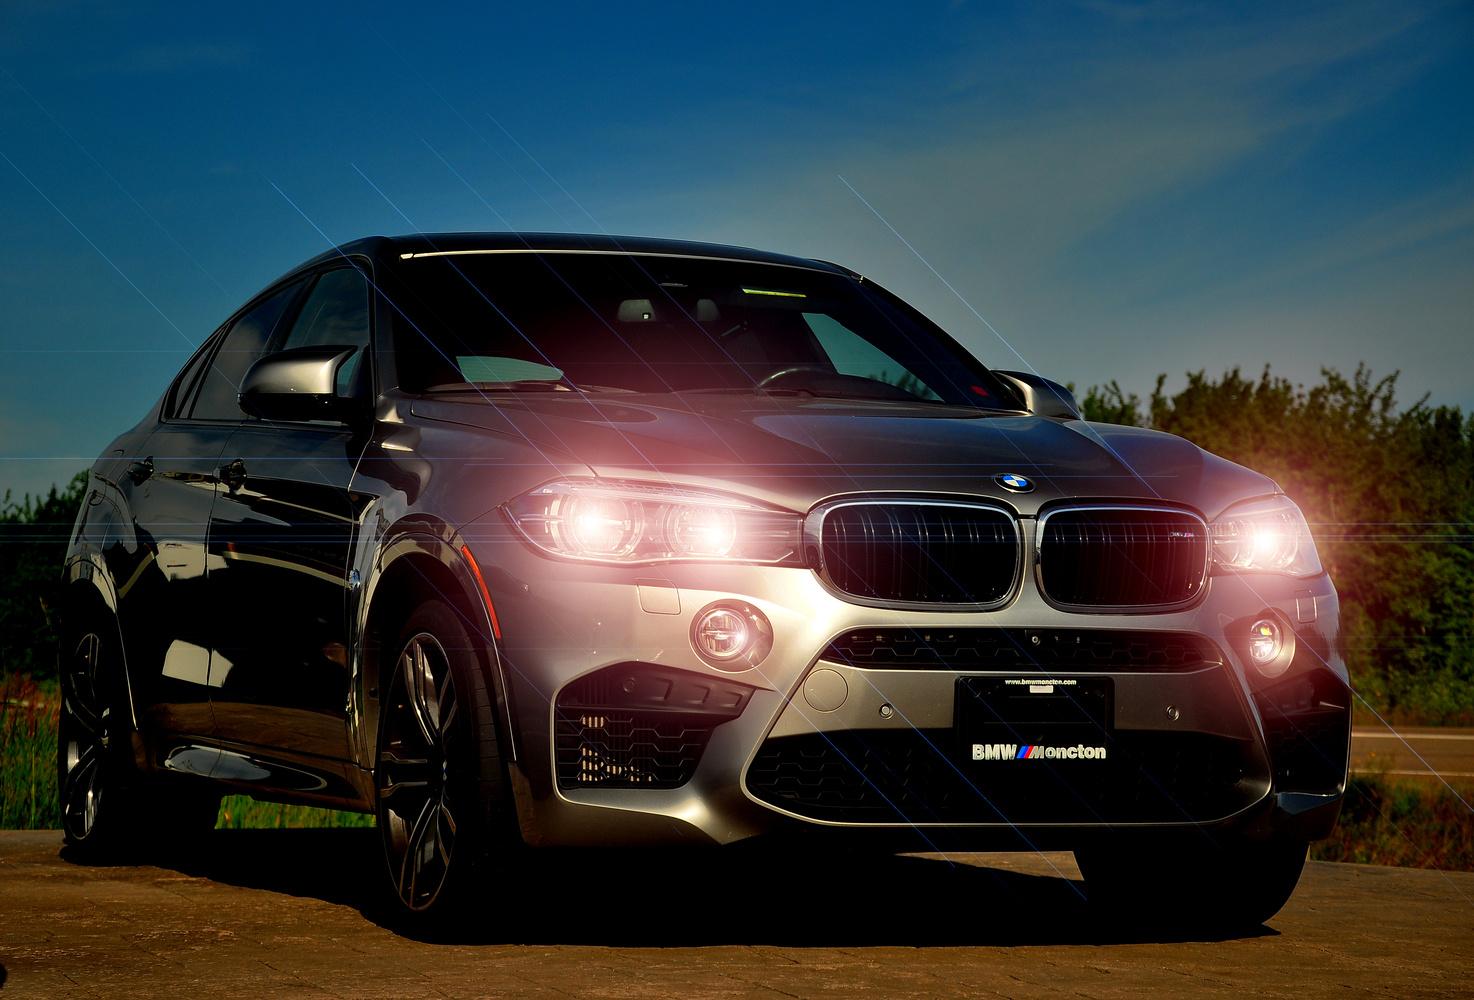 BMW X6 M by John Pettigrew